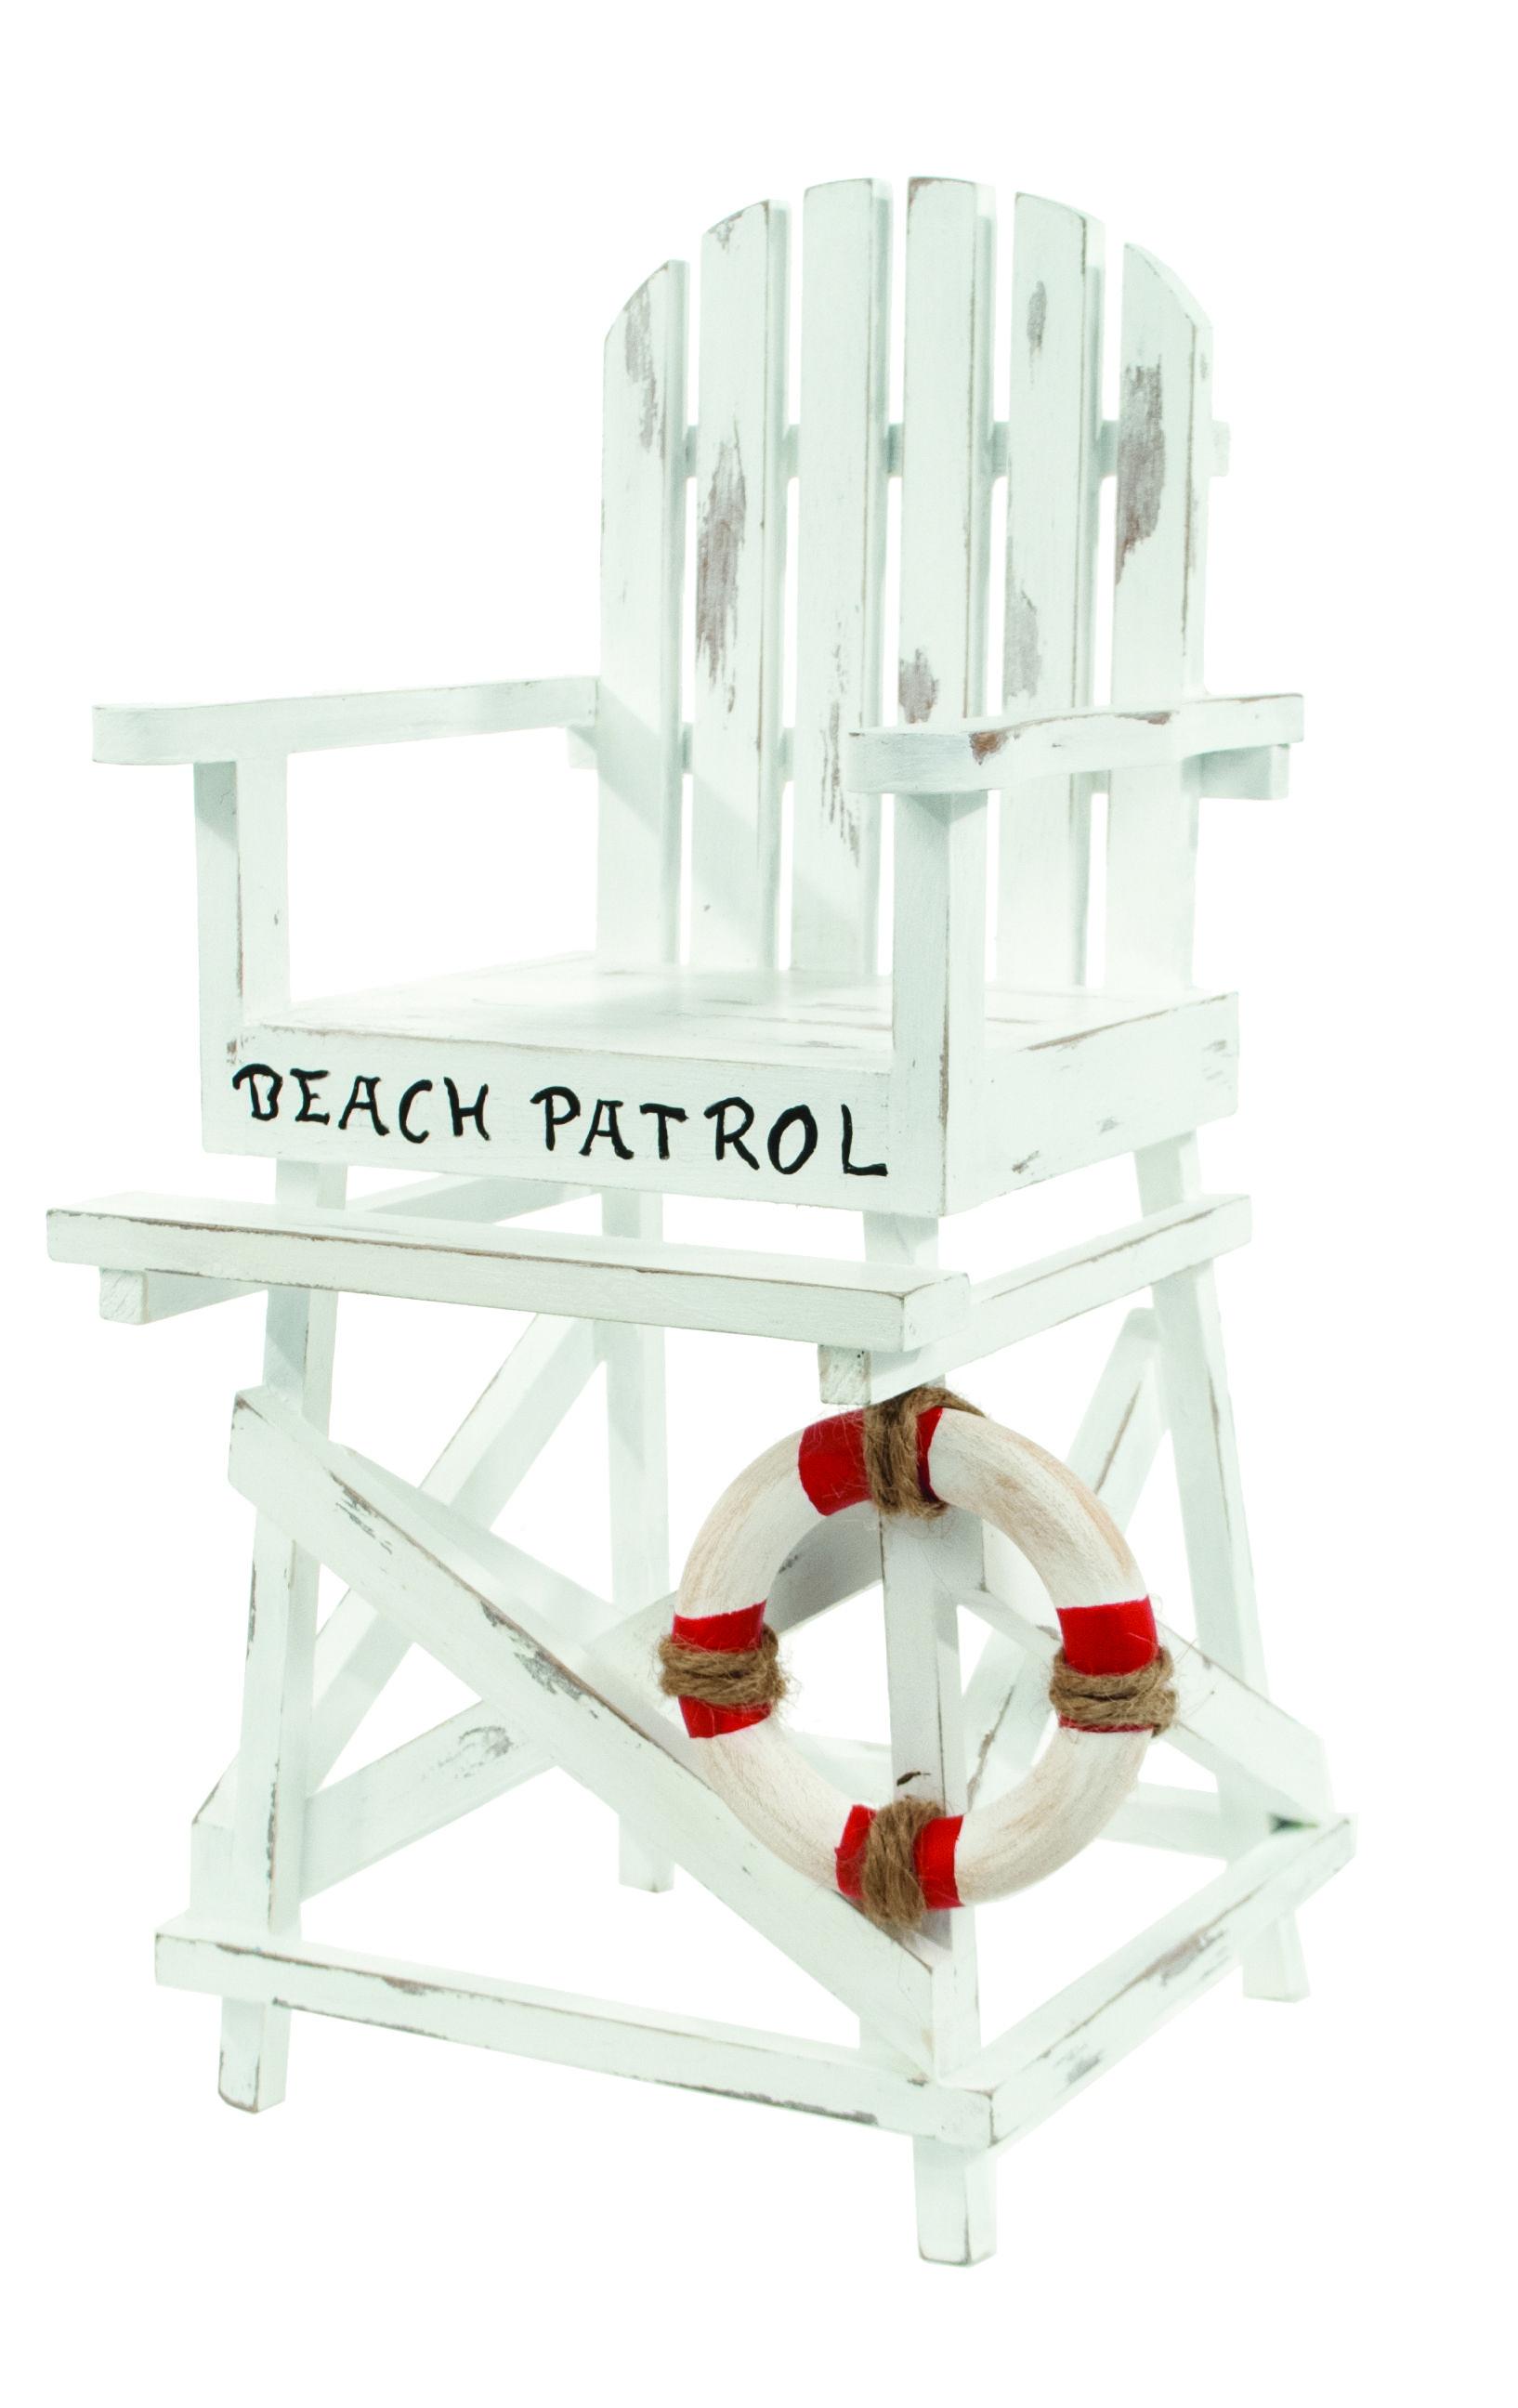 how to build a lifeguard chair key west hammock chairs plaid folkart beach patrol paint craft